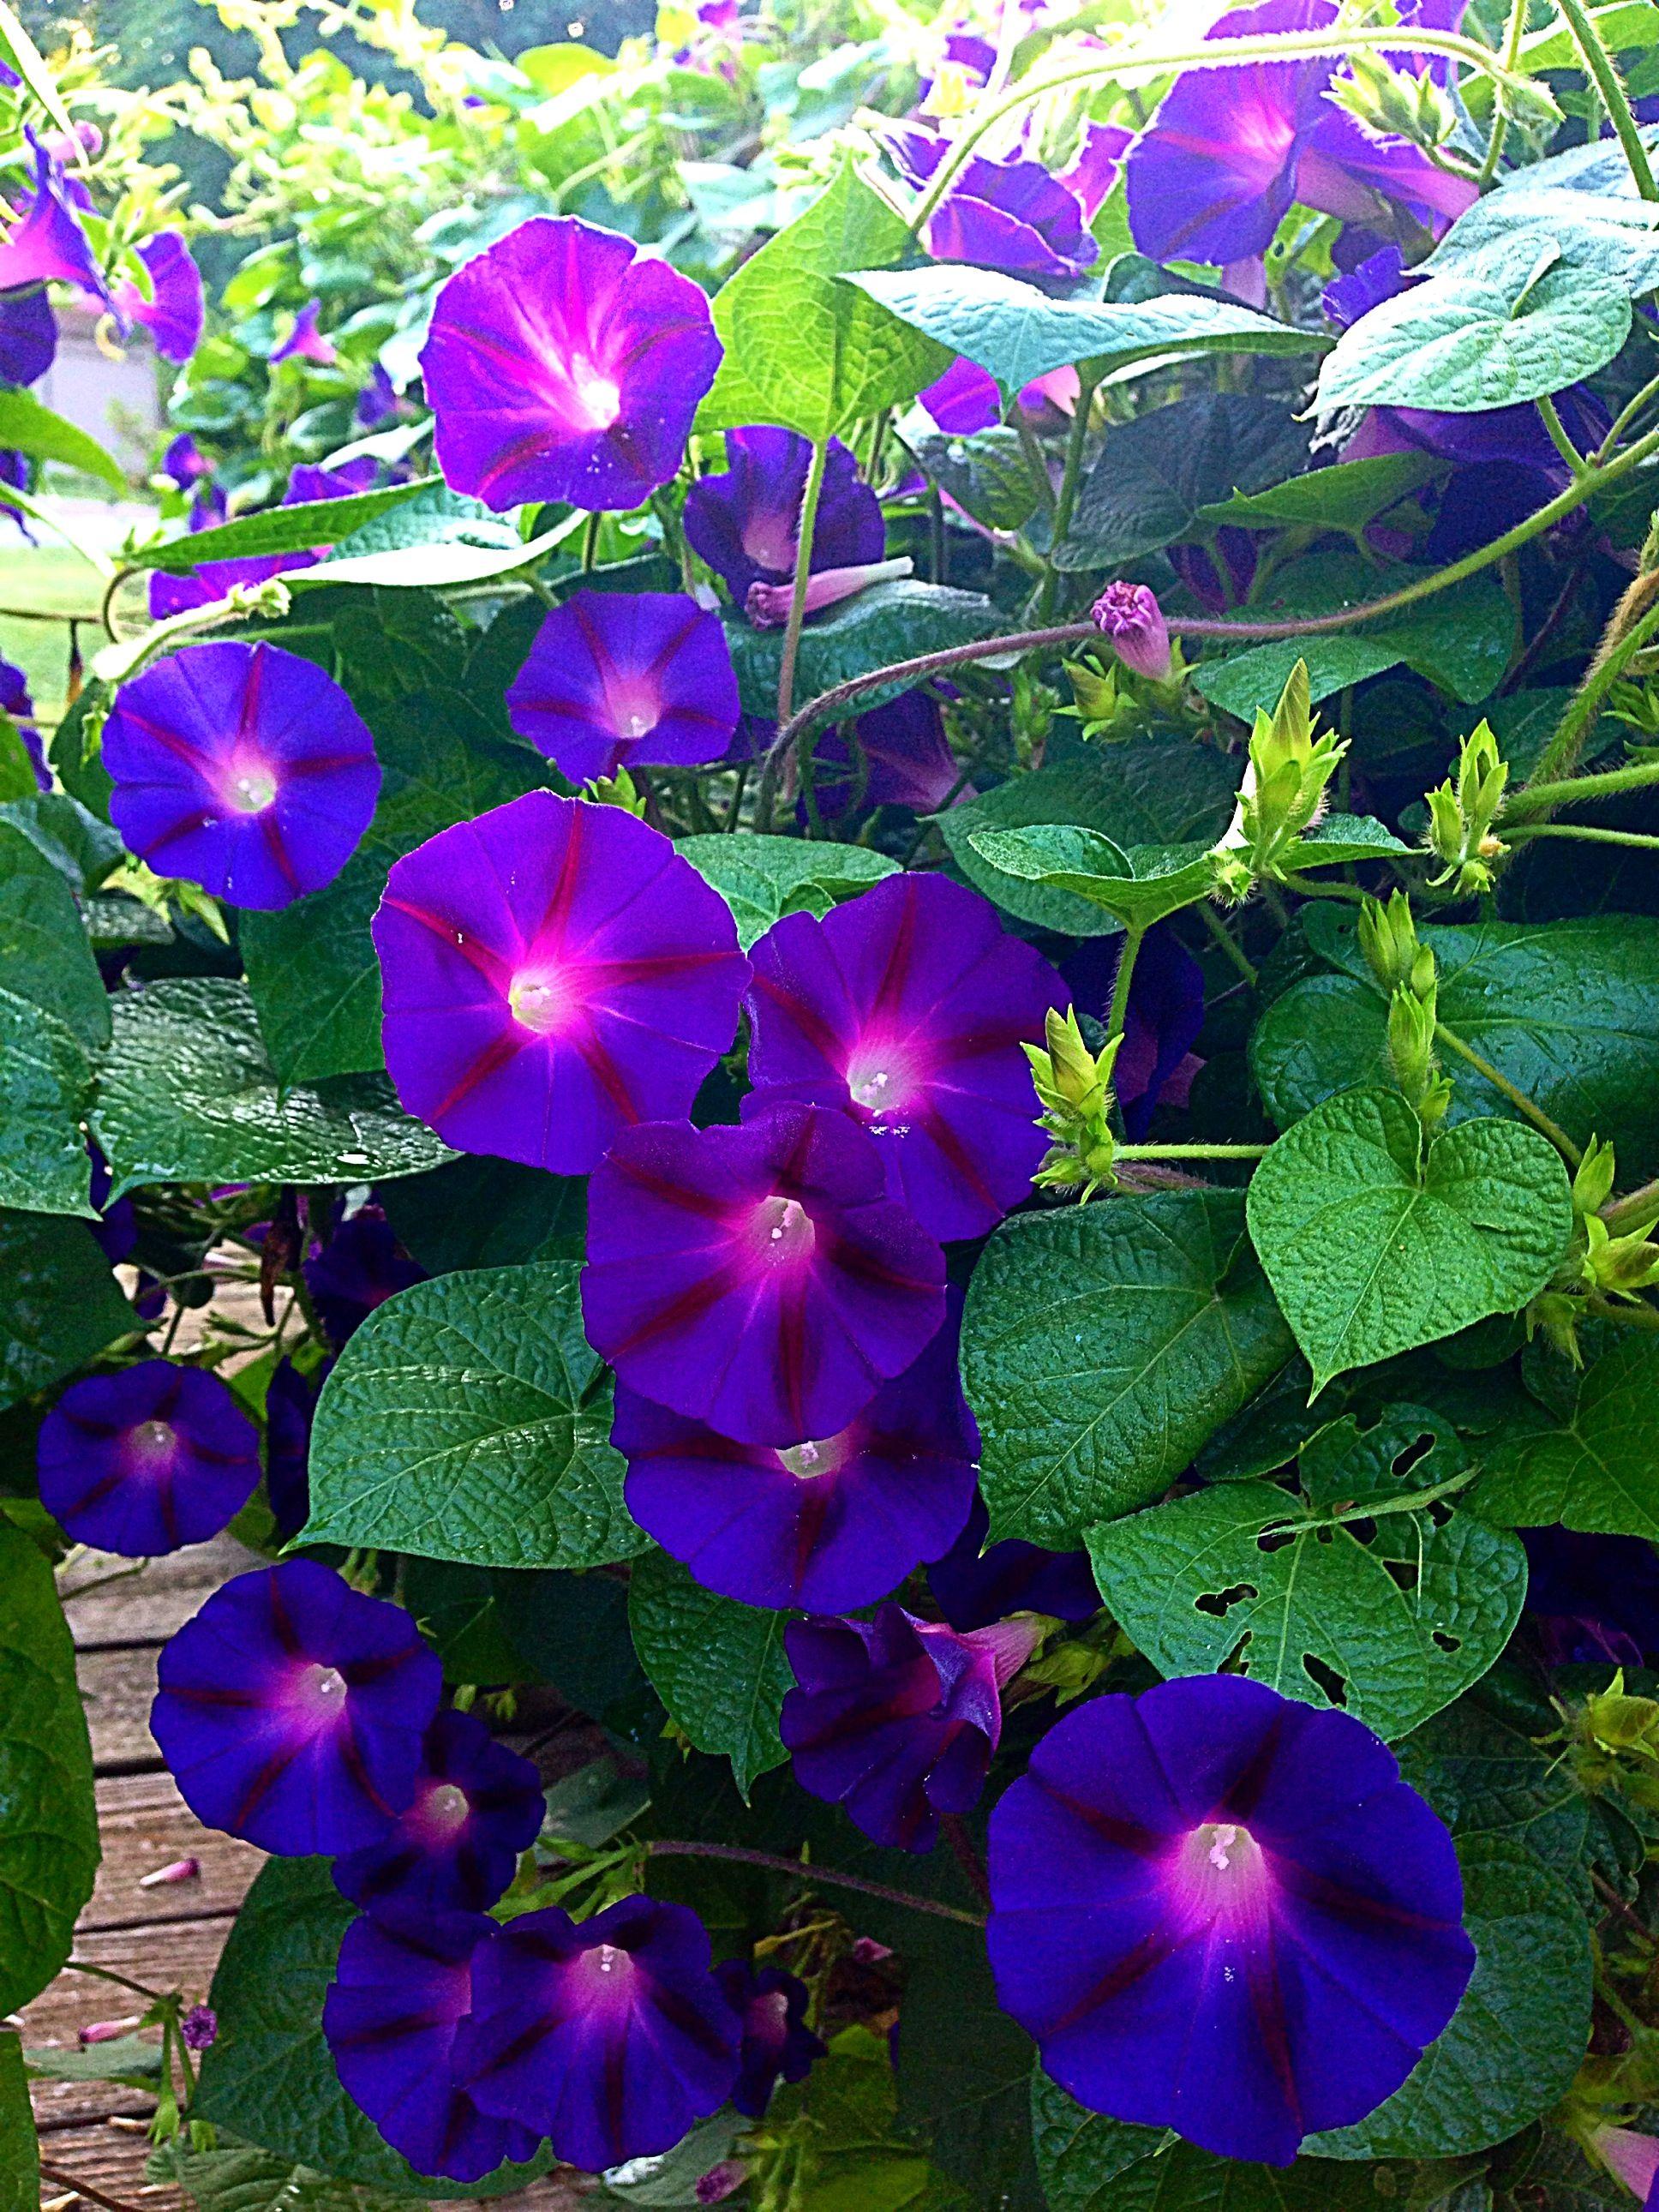 Morning Glories Beautiful Flowers Morning Glory Flowers Virtual Flowers